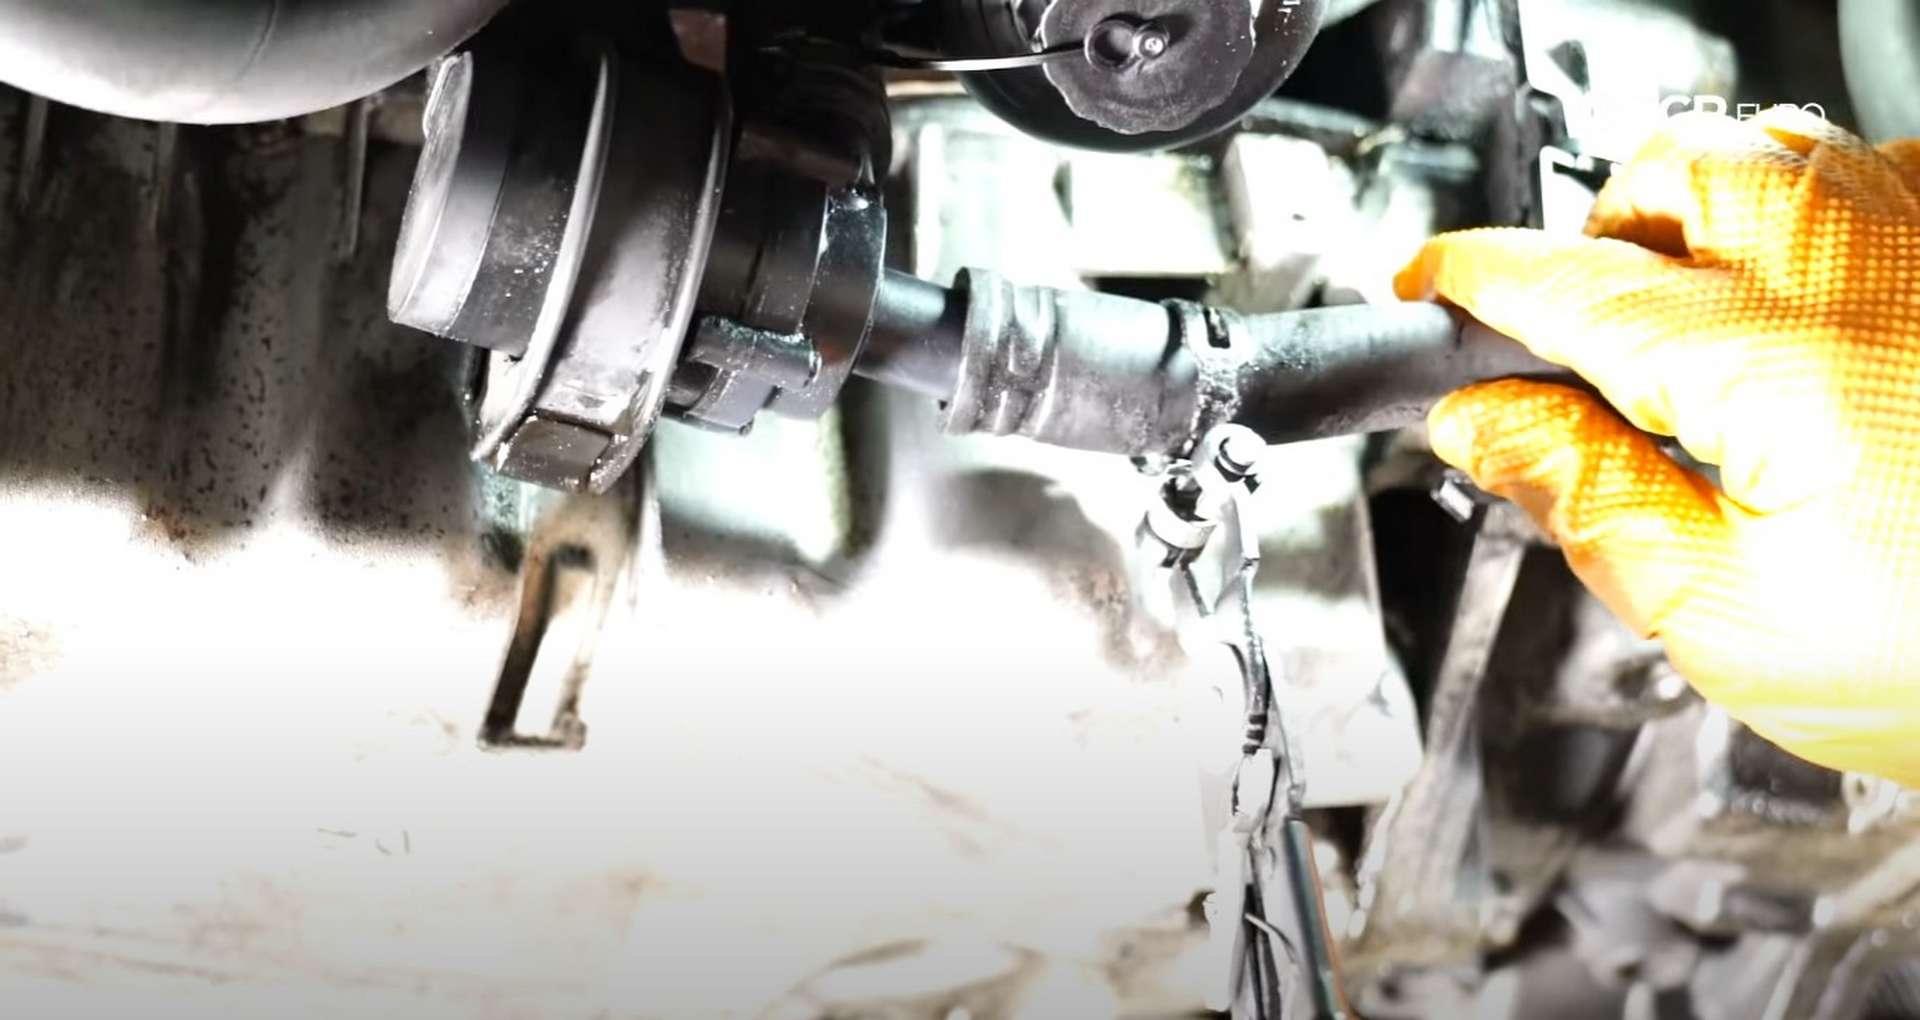 30-DIY-Mk5-GTI-Oil-FIlter-Housing_Reinstalling-Oil-Cooler